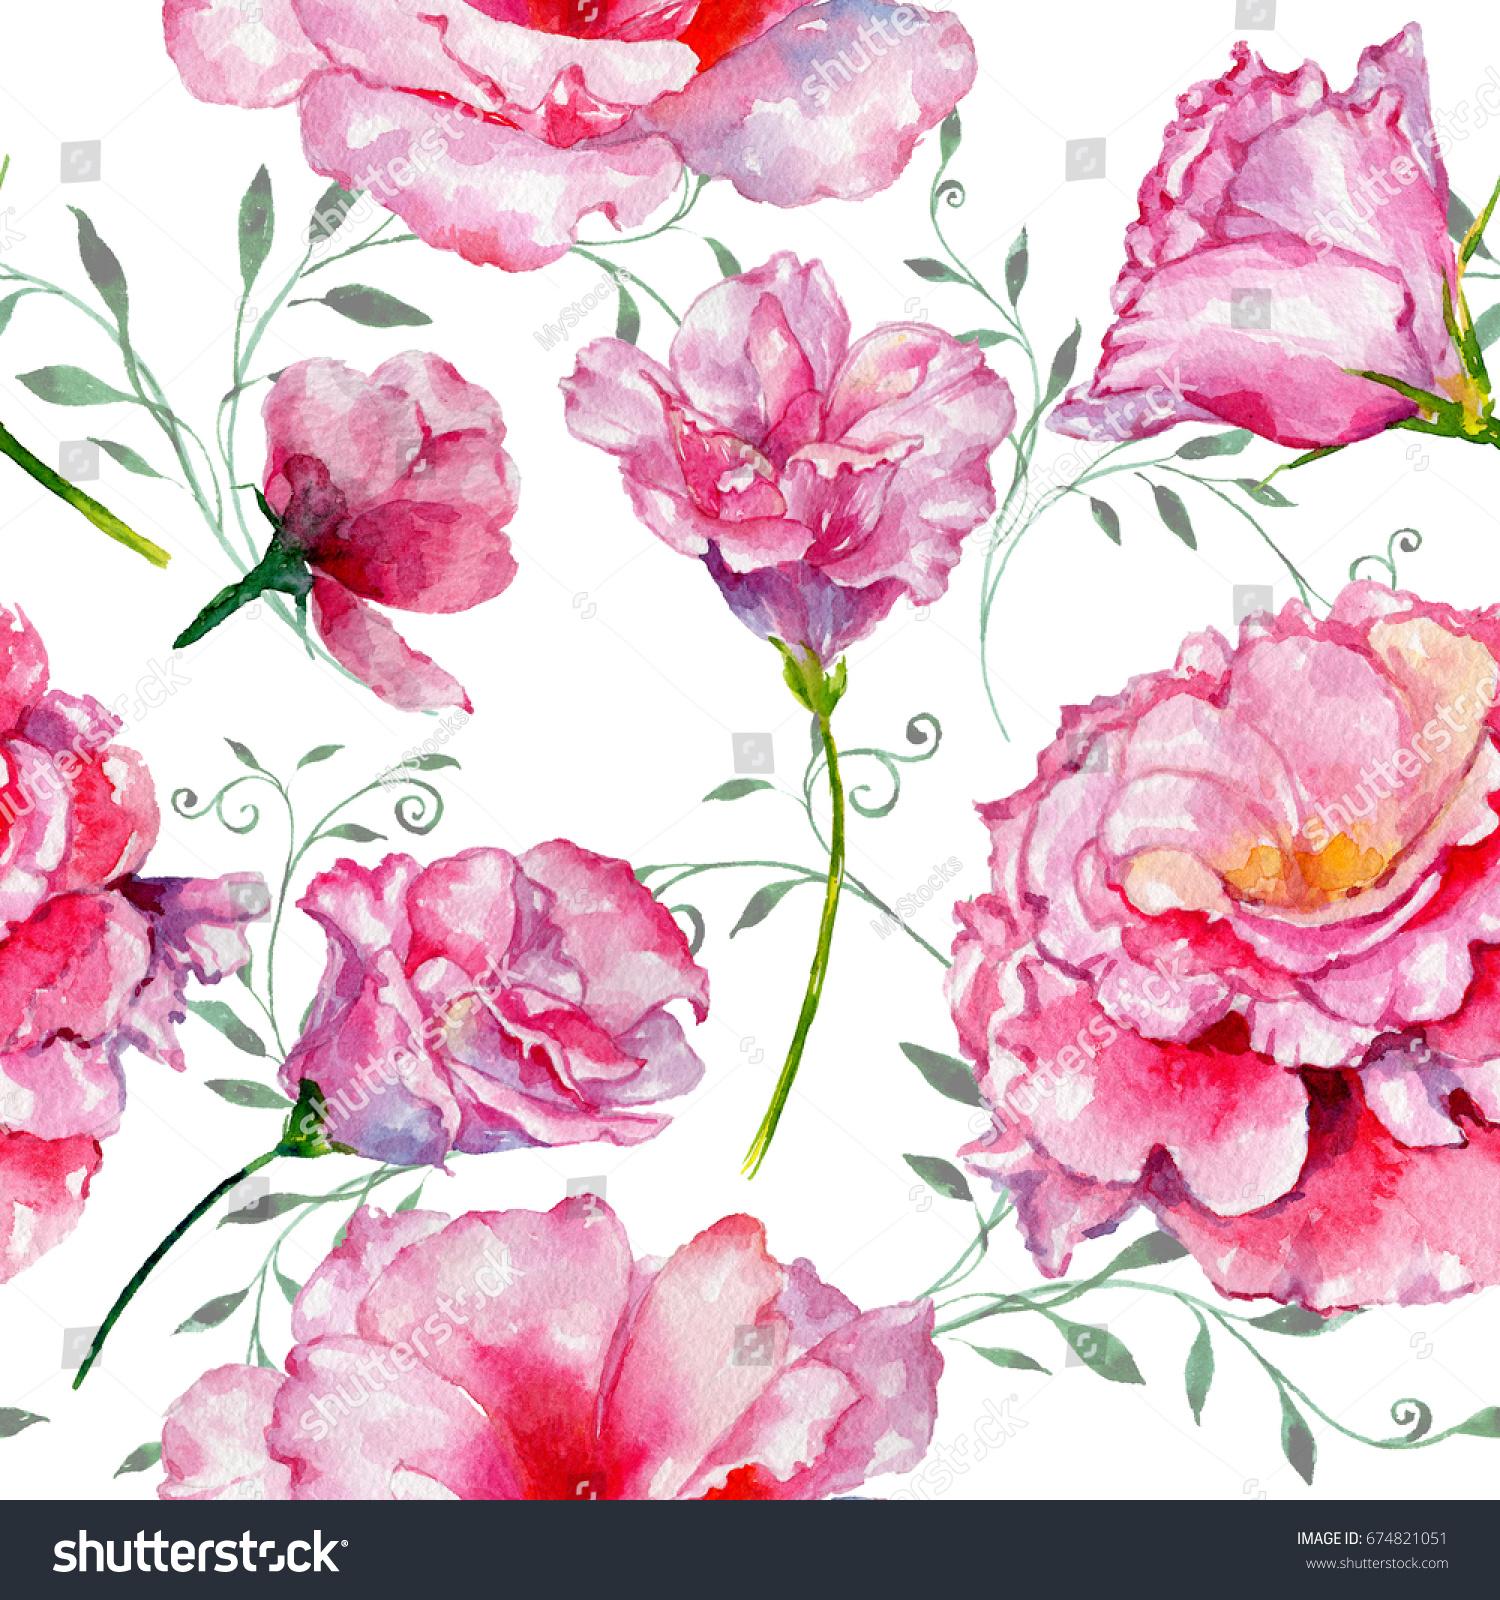 Spring Set Vintage Watercolor Bouquet Of Pink Roses Leaves Blooming